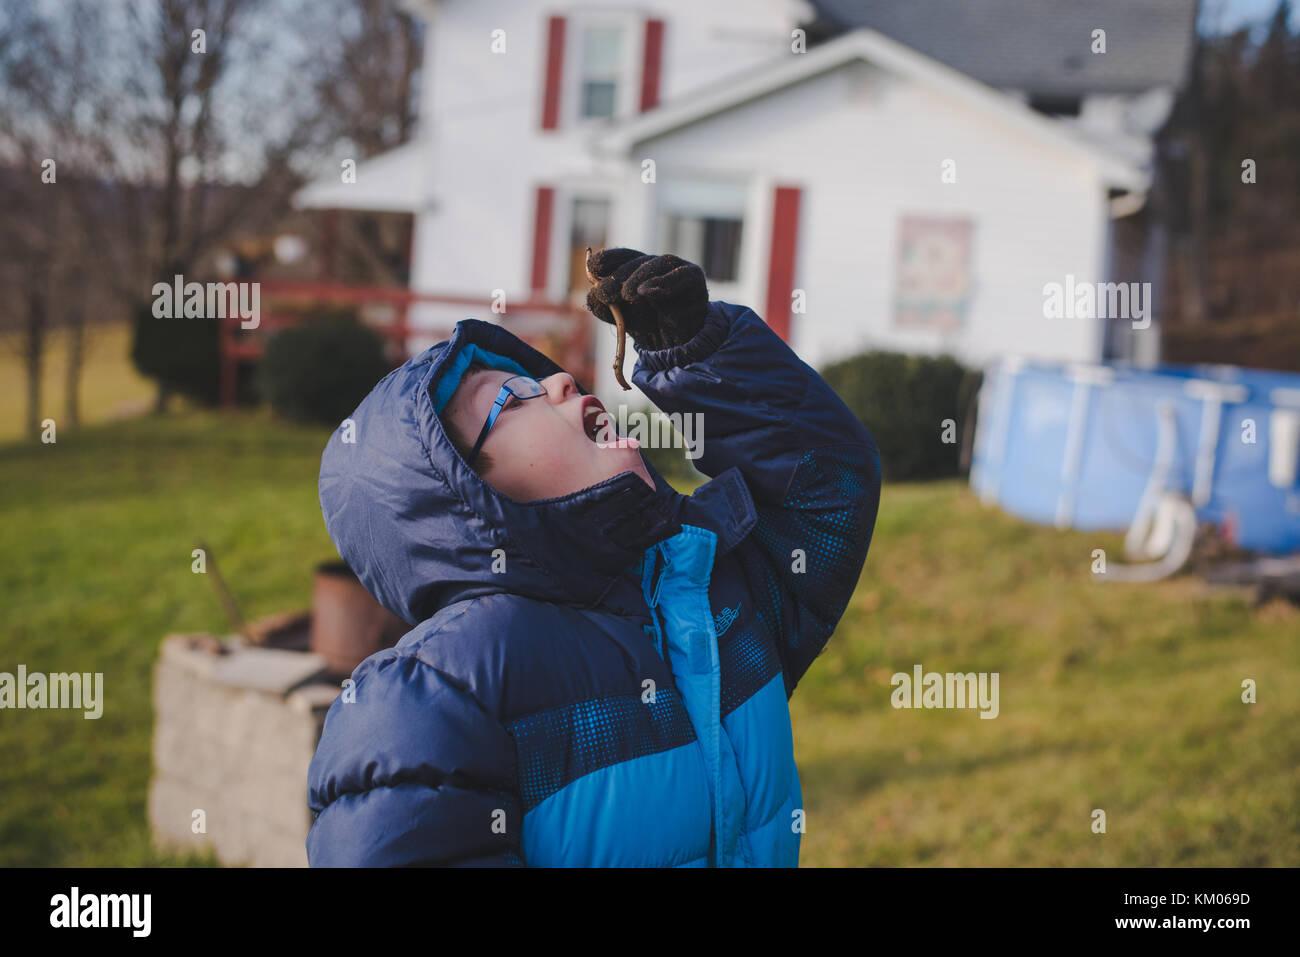 Un garçon fait semblant de manger un ver. Photo Stock